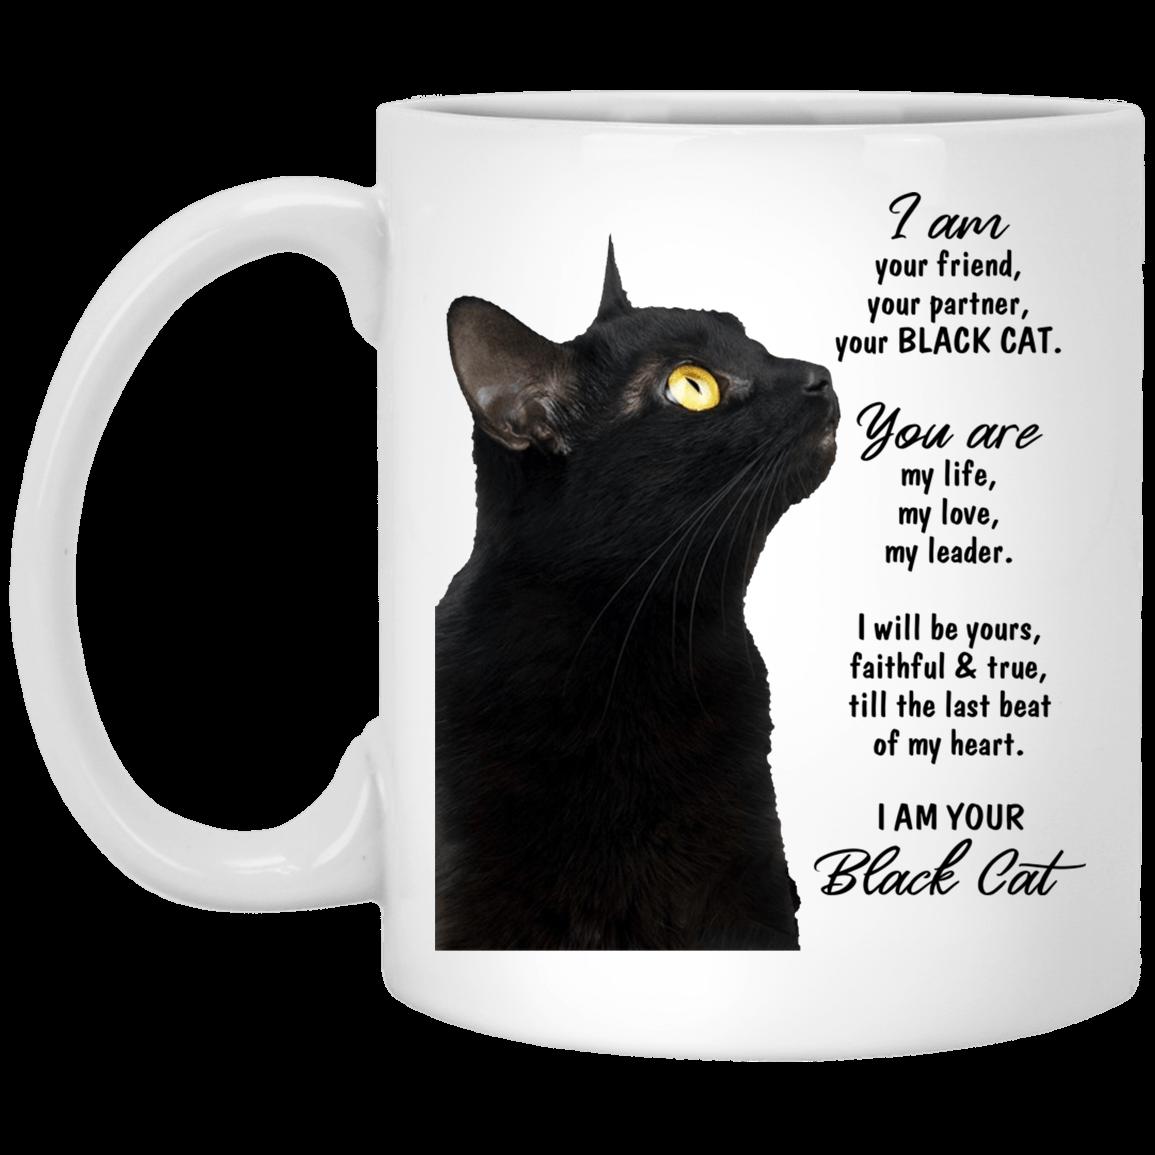 Funny Black Cat Mug I Am Your Friend Your Partner Your Black Cat Mug Cubebik